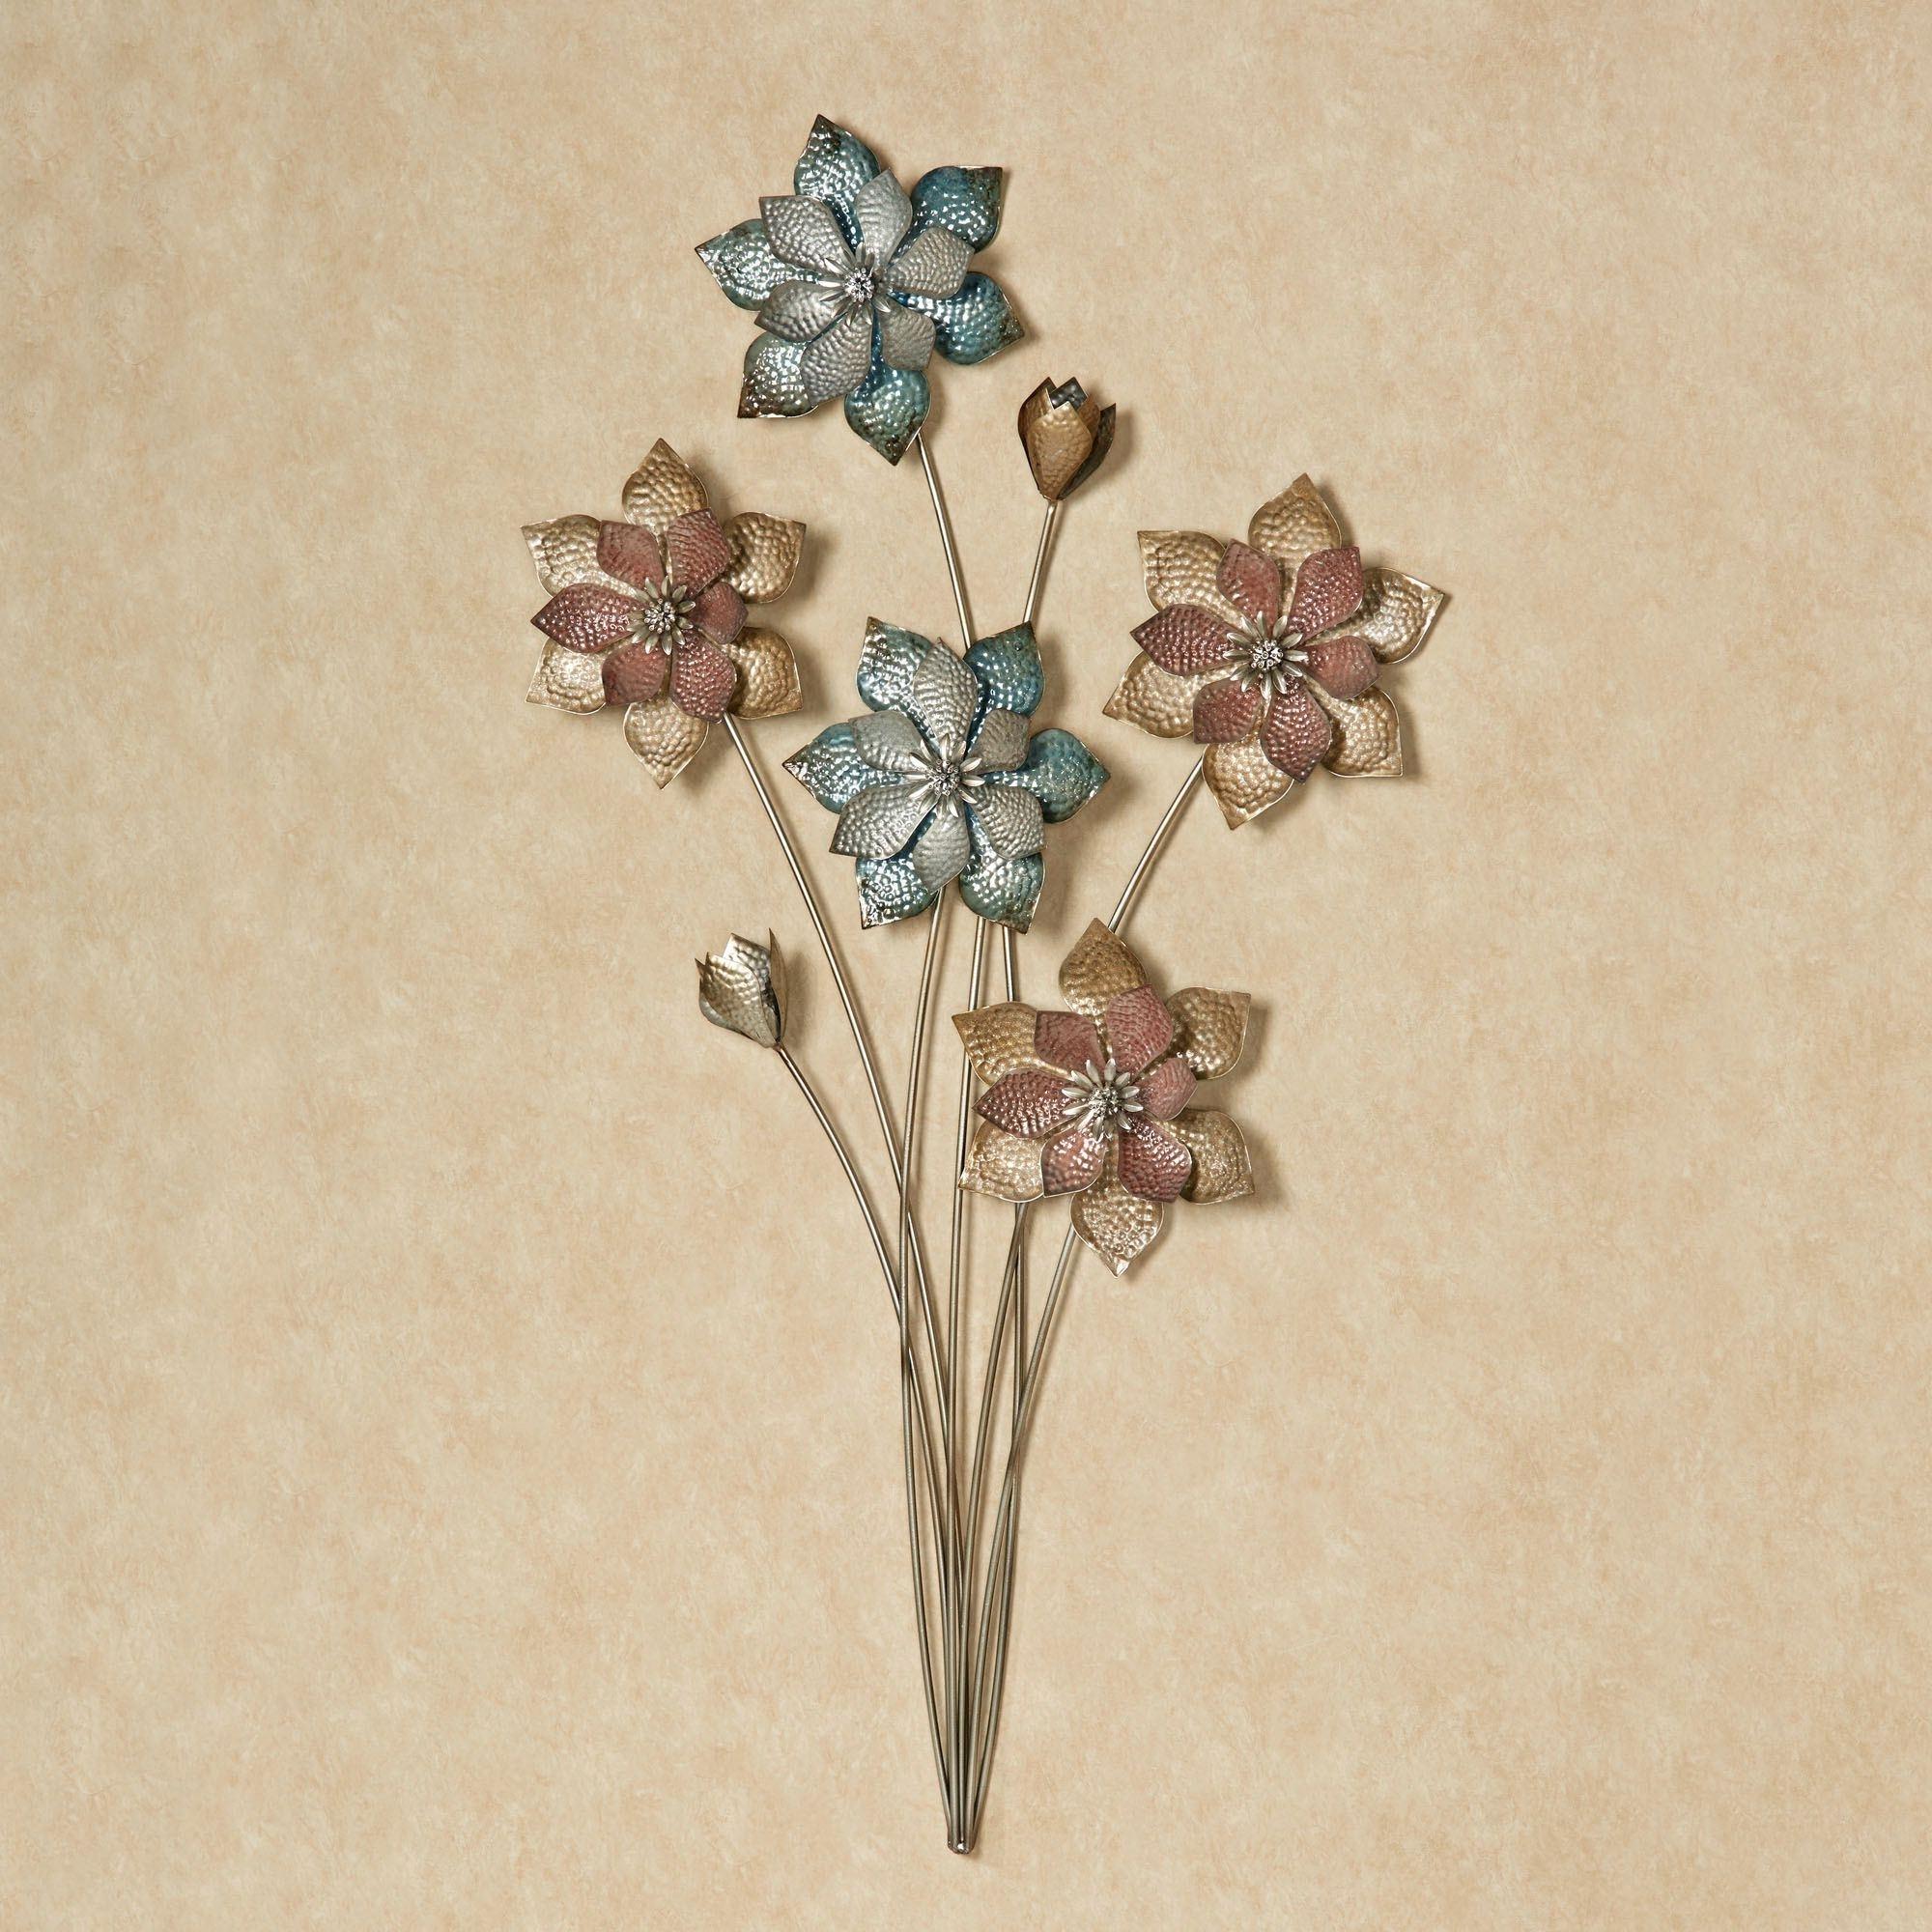 Metal Flower Wall Art Regarding Well Known Evening Flowers Metal Wall Art (View 13 of 15)